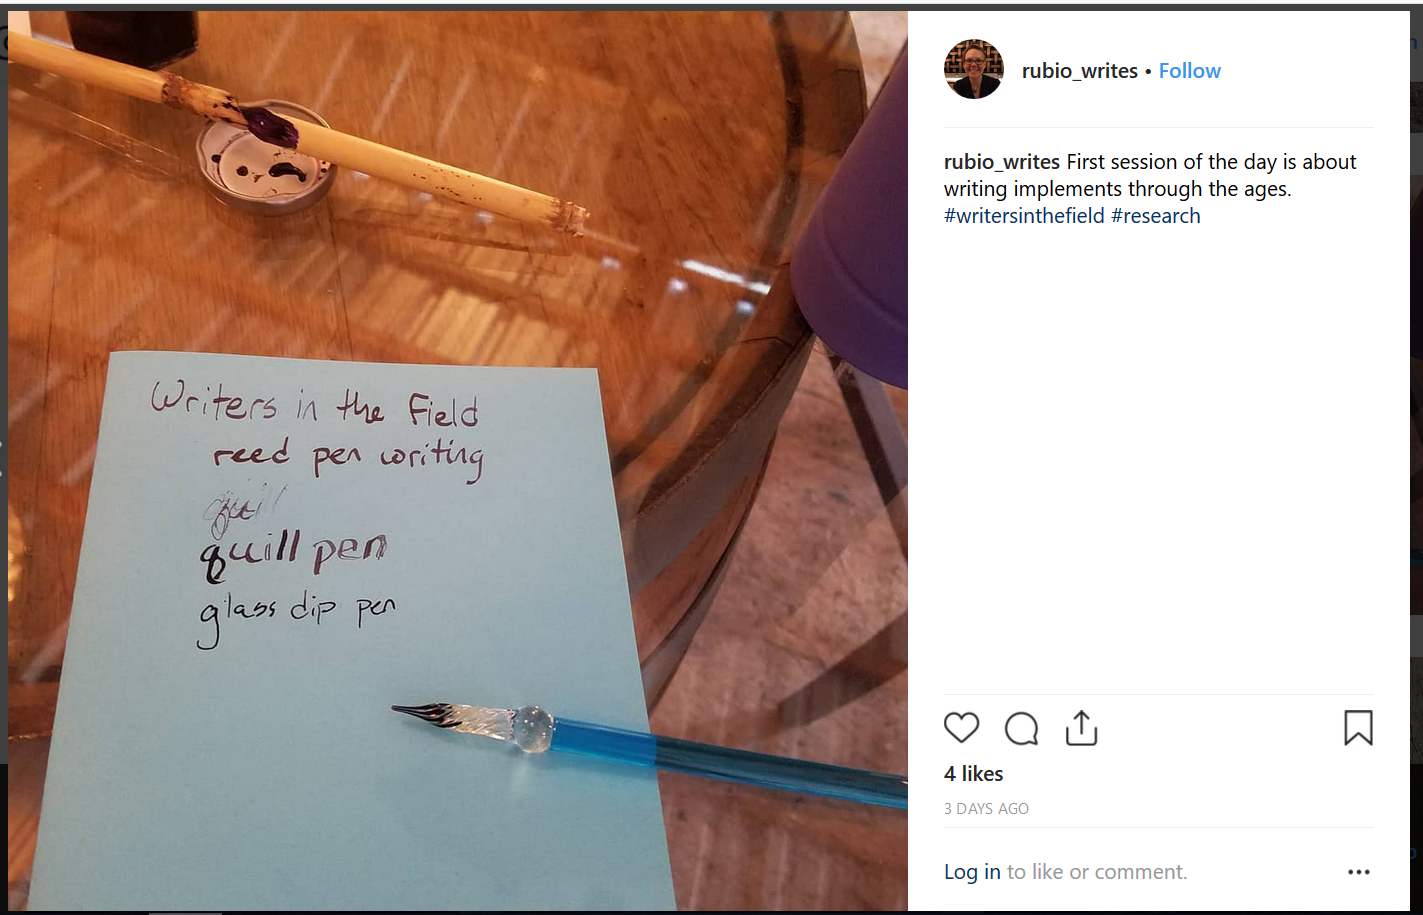 rubio_writes 3.png